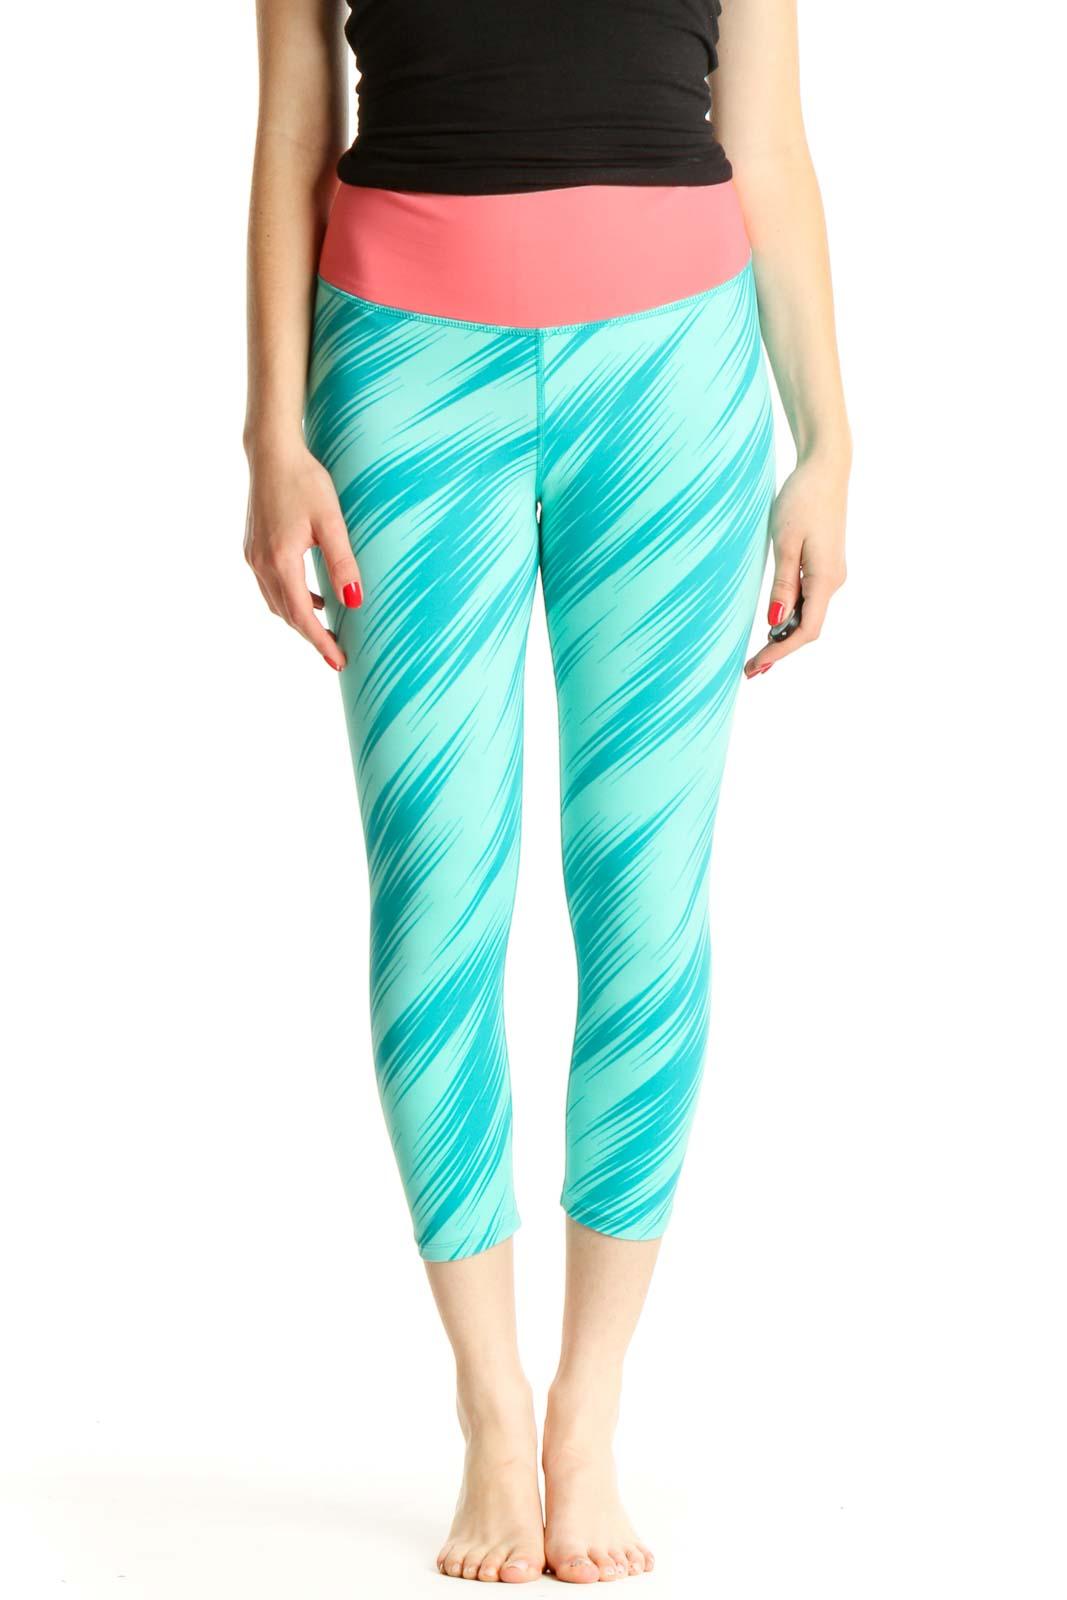 Blue Printed Activewear Leggings Front